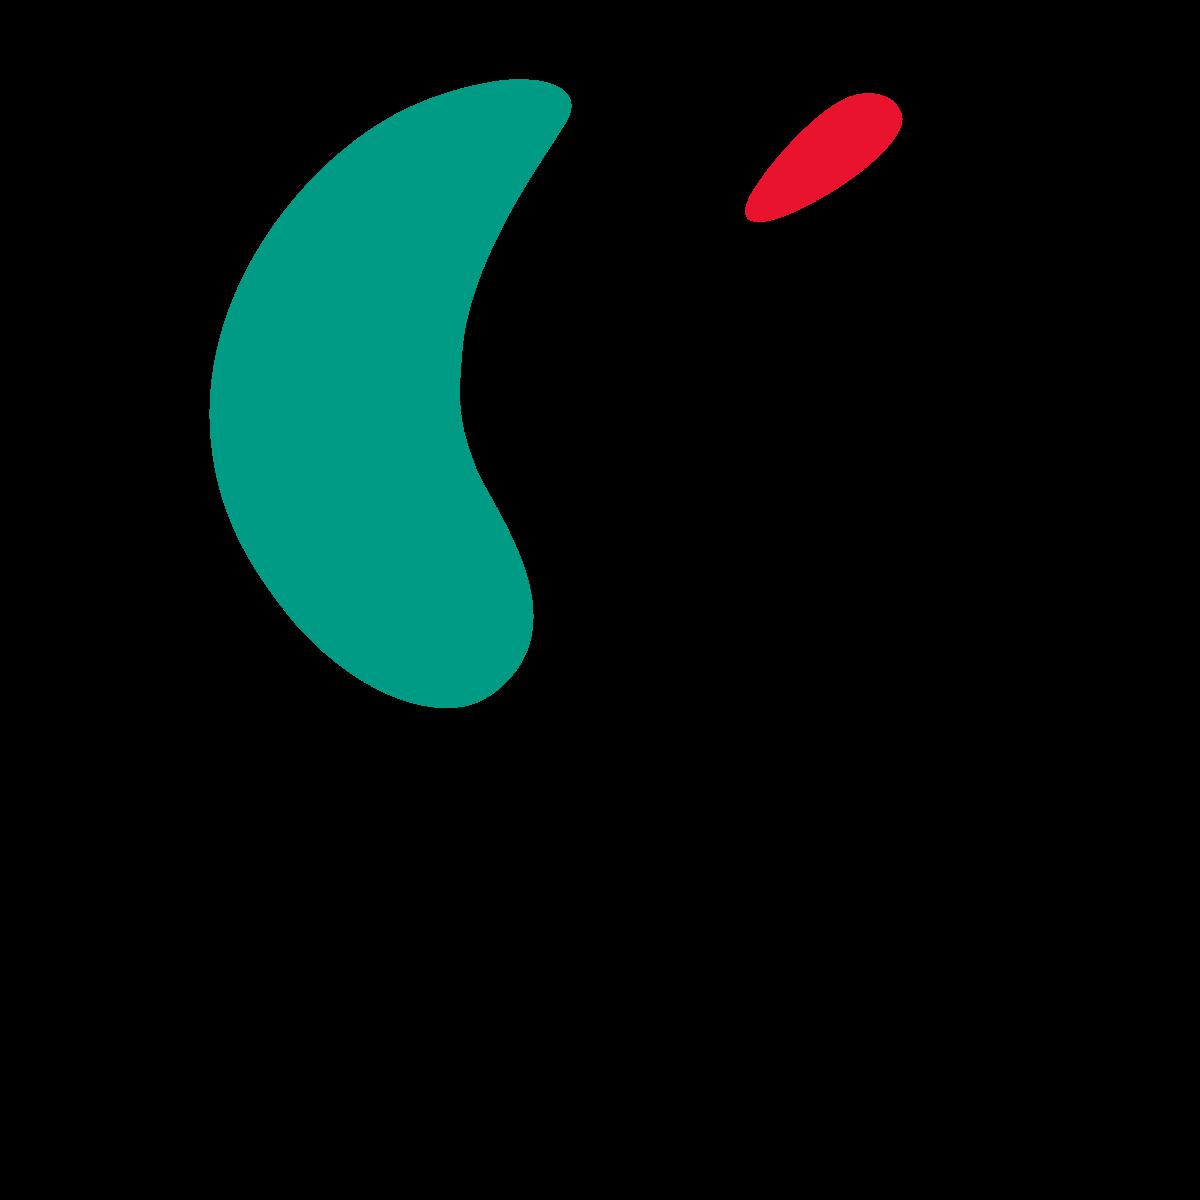 TV Console Partners Singapore